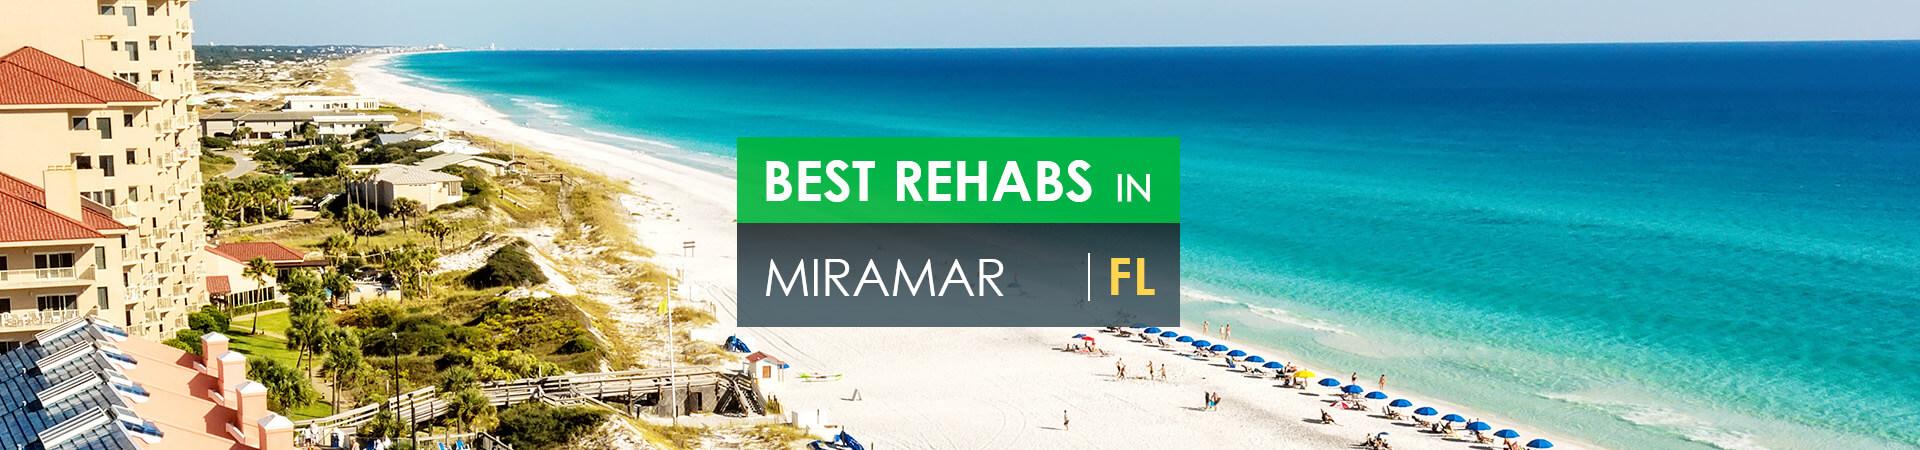 Best rehabs in Miramar, FL